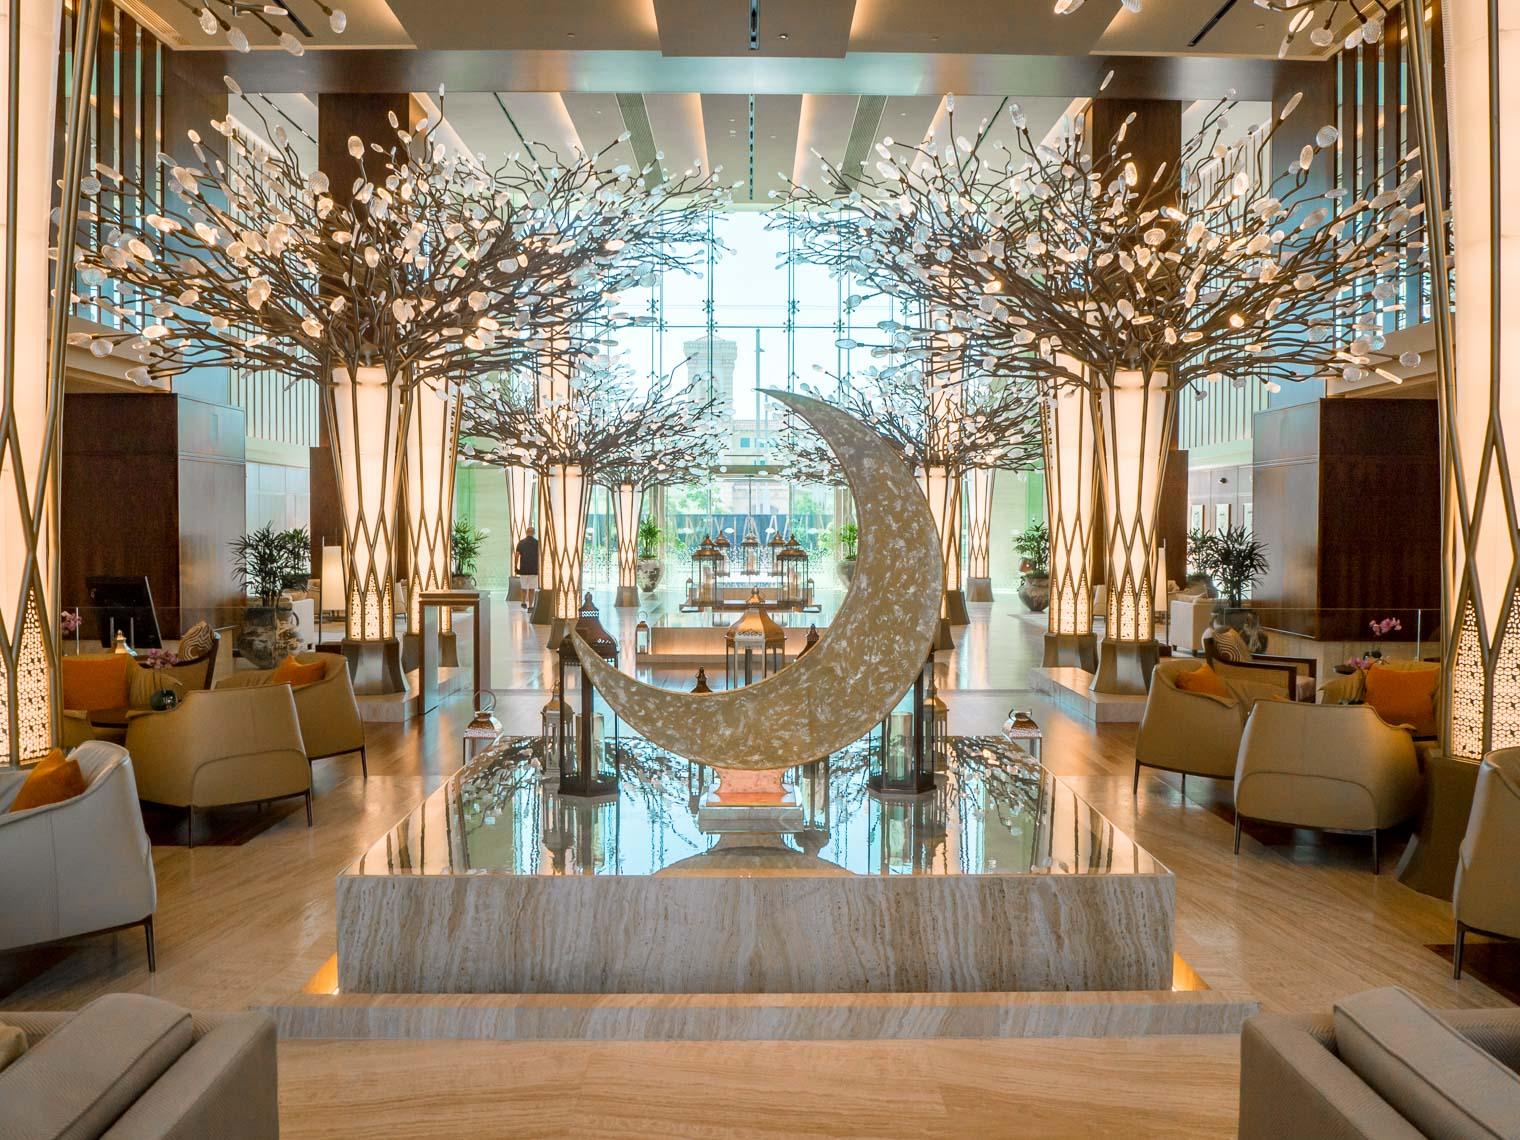 Mandarin Oriental Dubai interiors